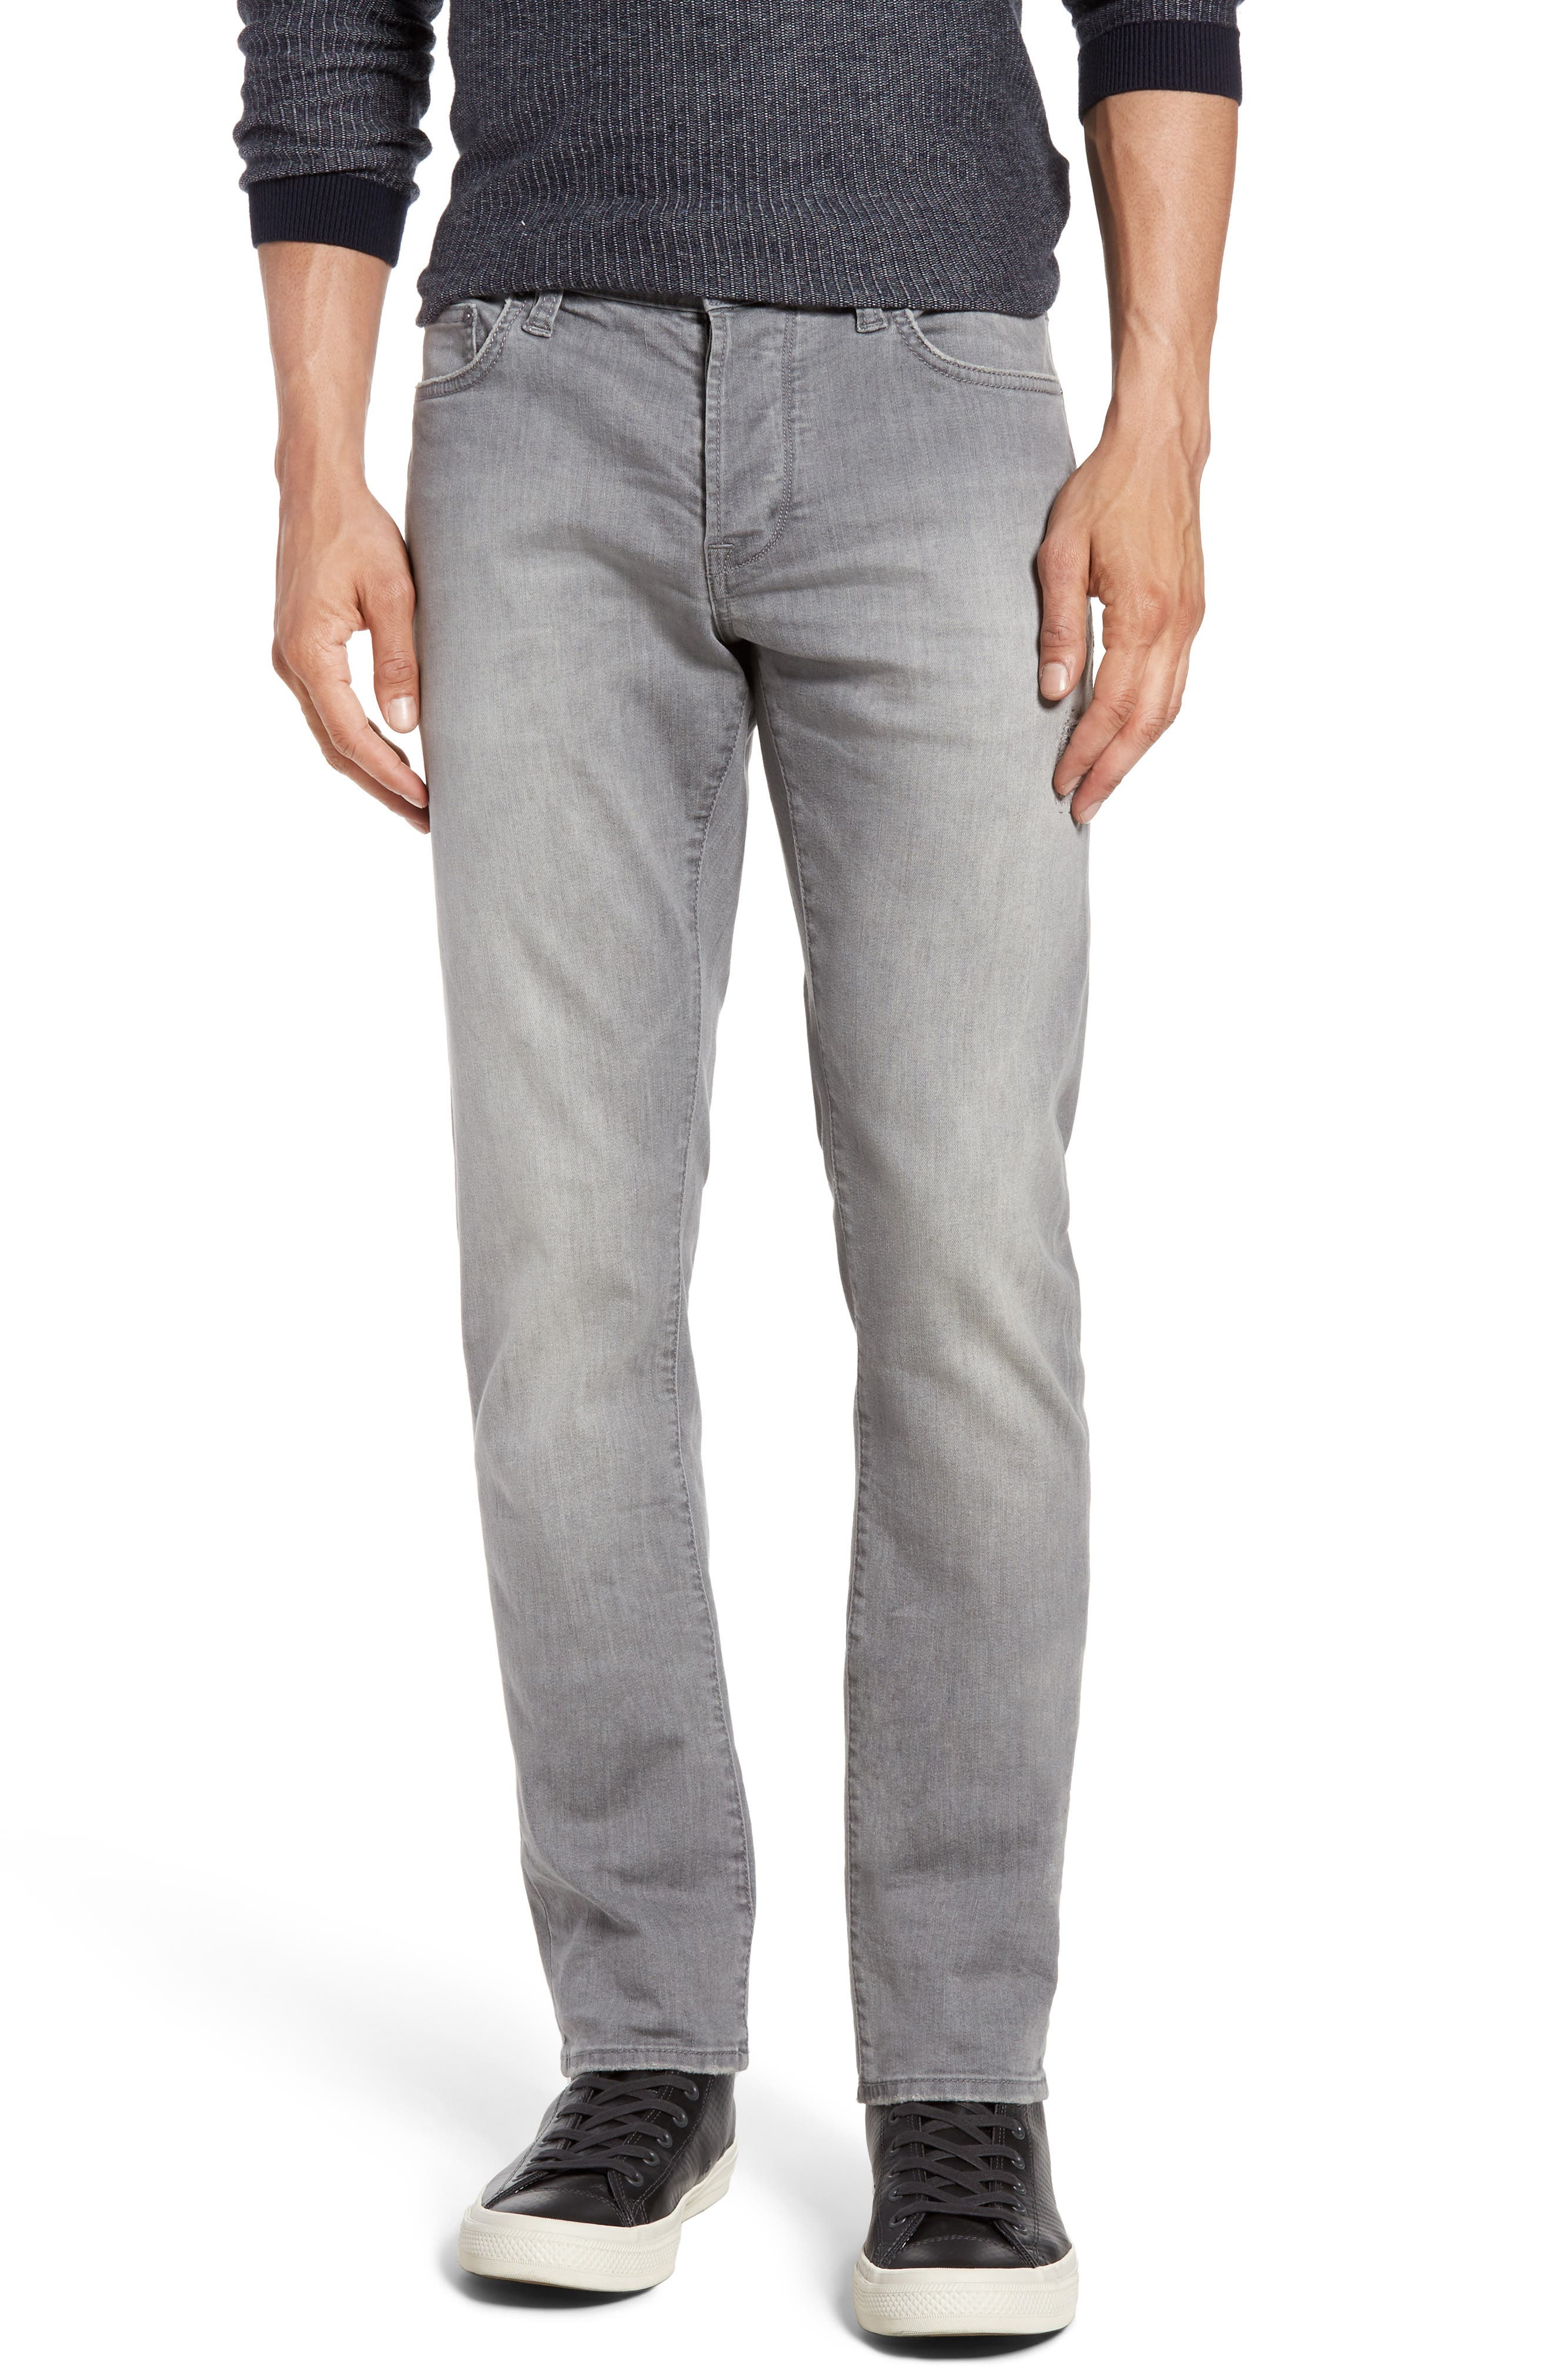 Wight Skinny Jeans,                         Main,                         color, Medium Grey